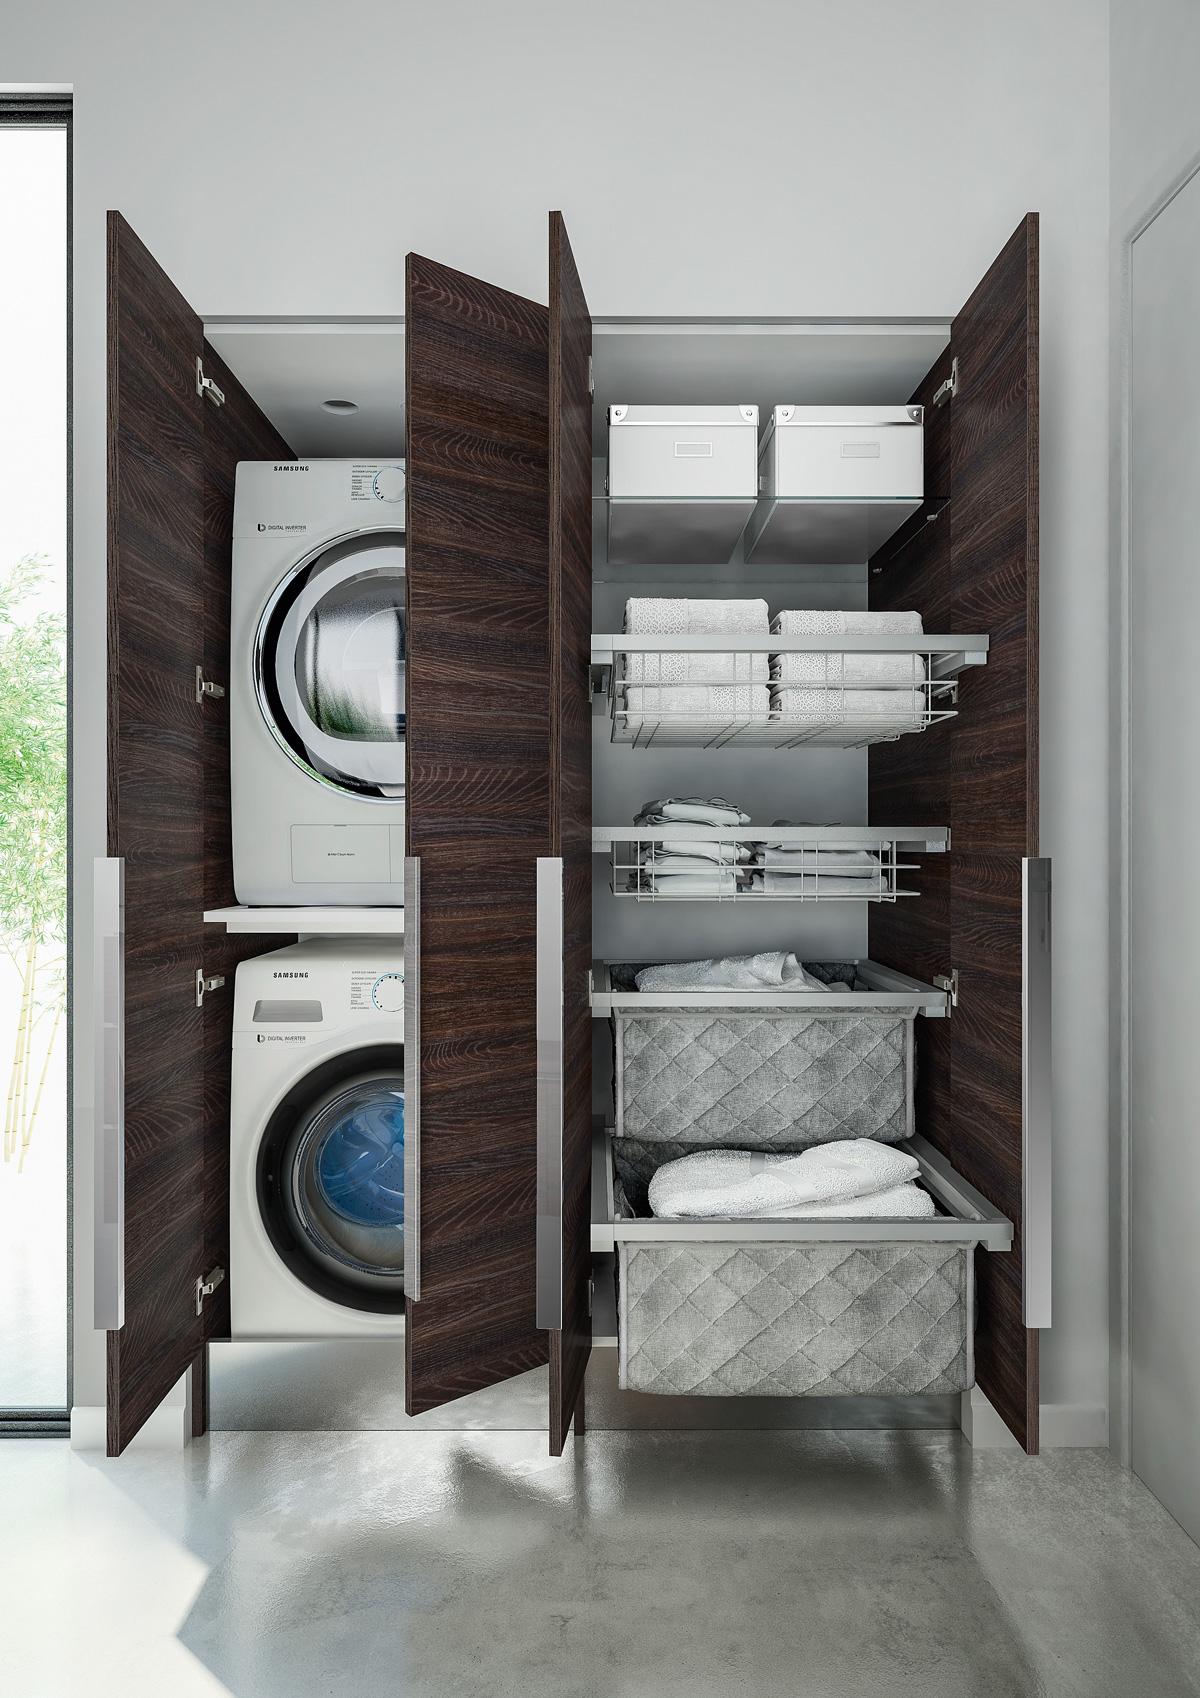 Asciugatrice sopra lavatrice kit - Mobile porta lavatrice ...